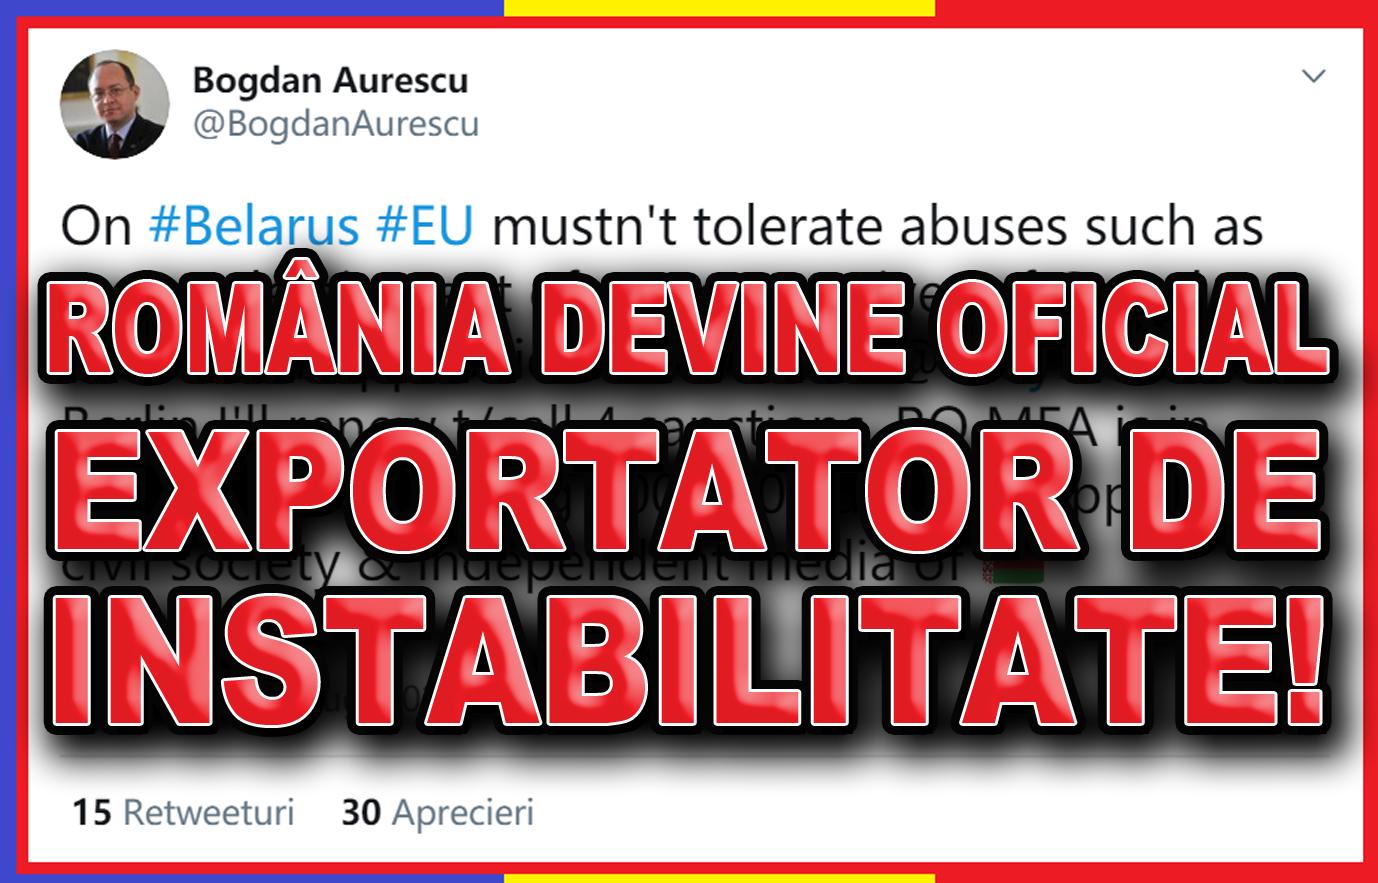 https://i0.wp.com/dantomozei.ro/wp-content/uploads/2020/08/Romania-exportator-de-instabilitate.jpg